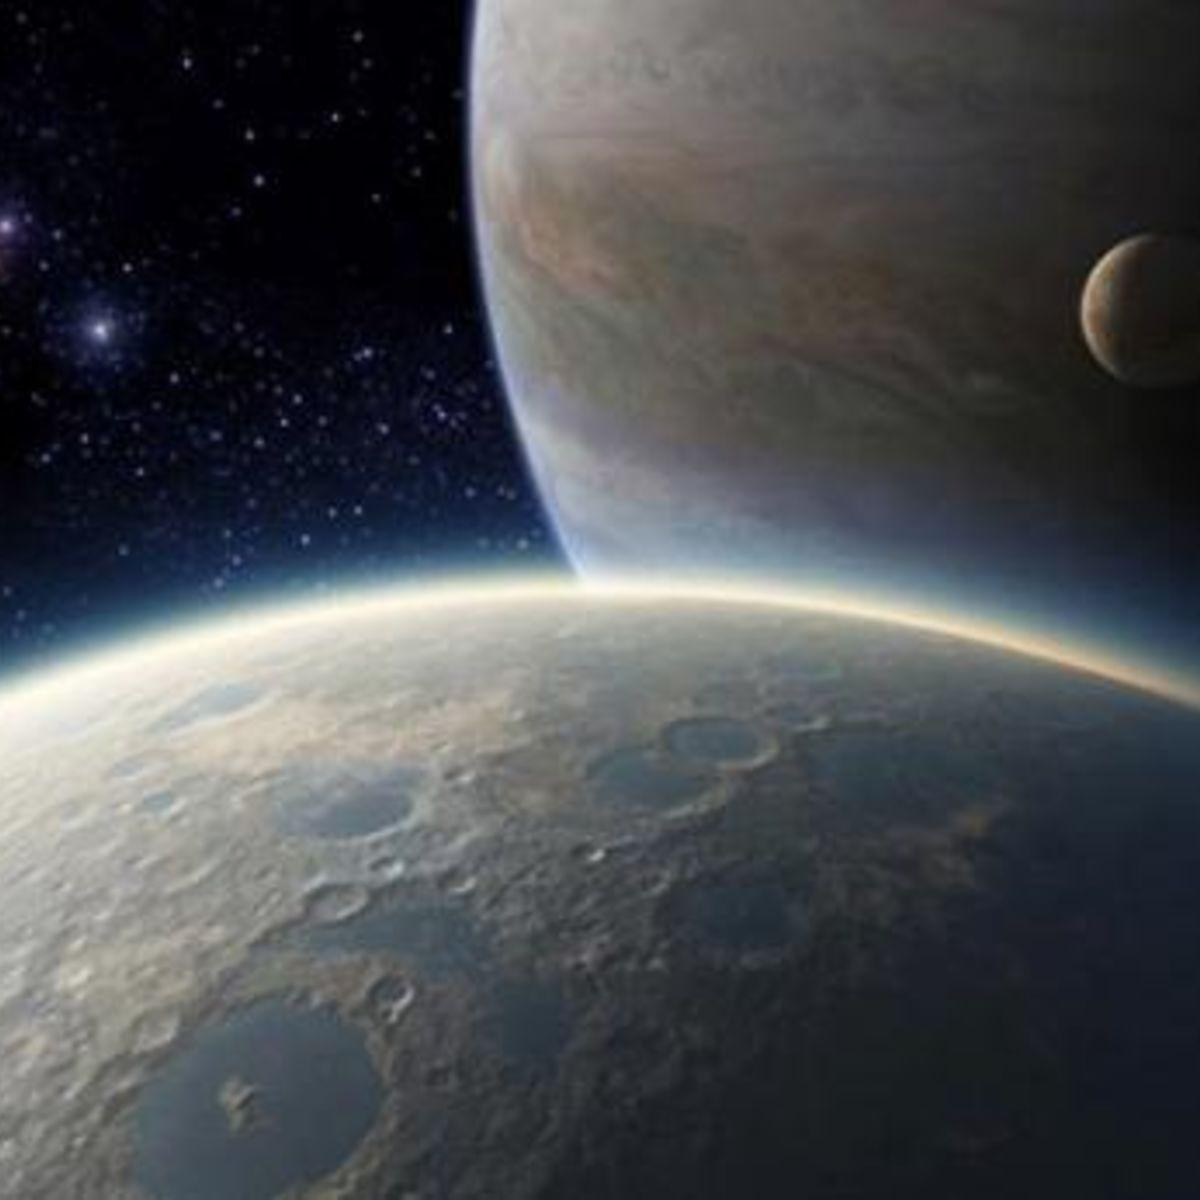 140131_MYST_EarthlikePlanet.jpg.CROP.rectangle-large.jpg